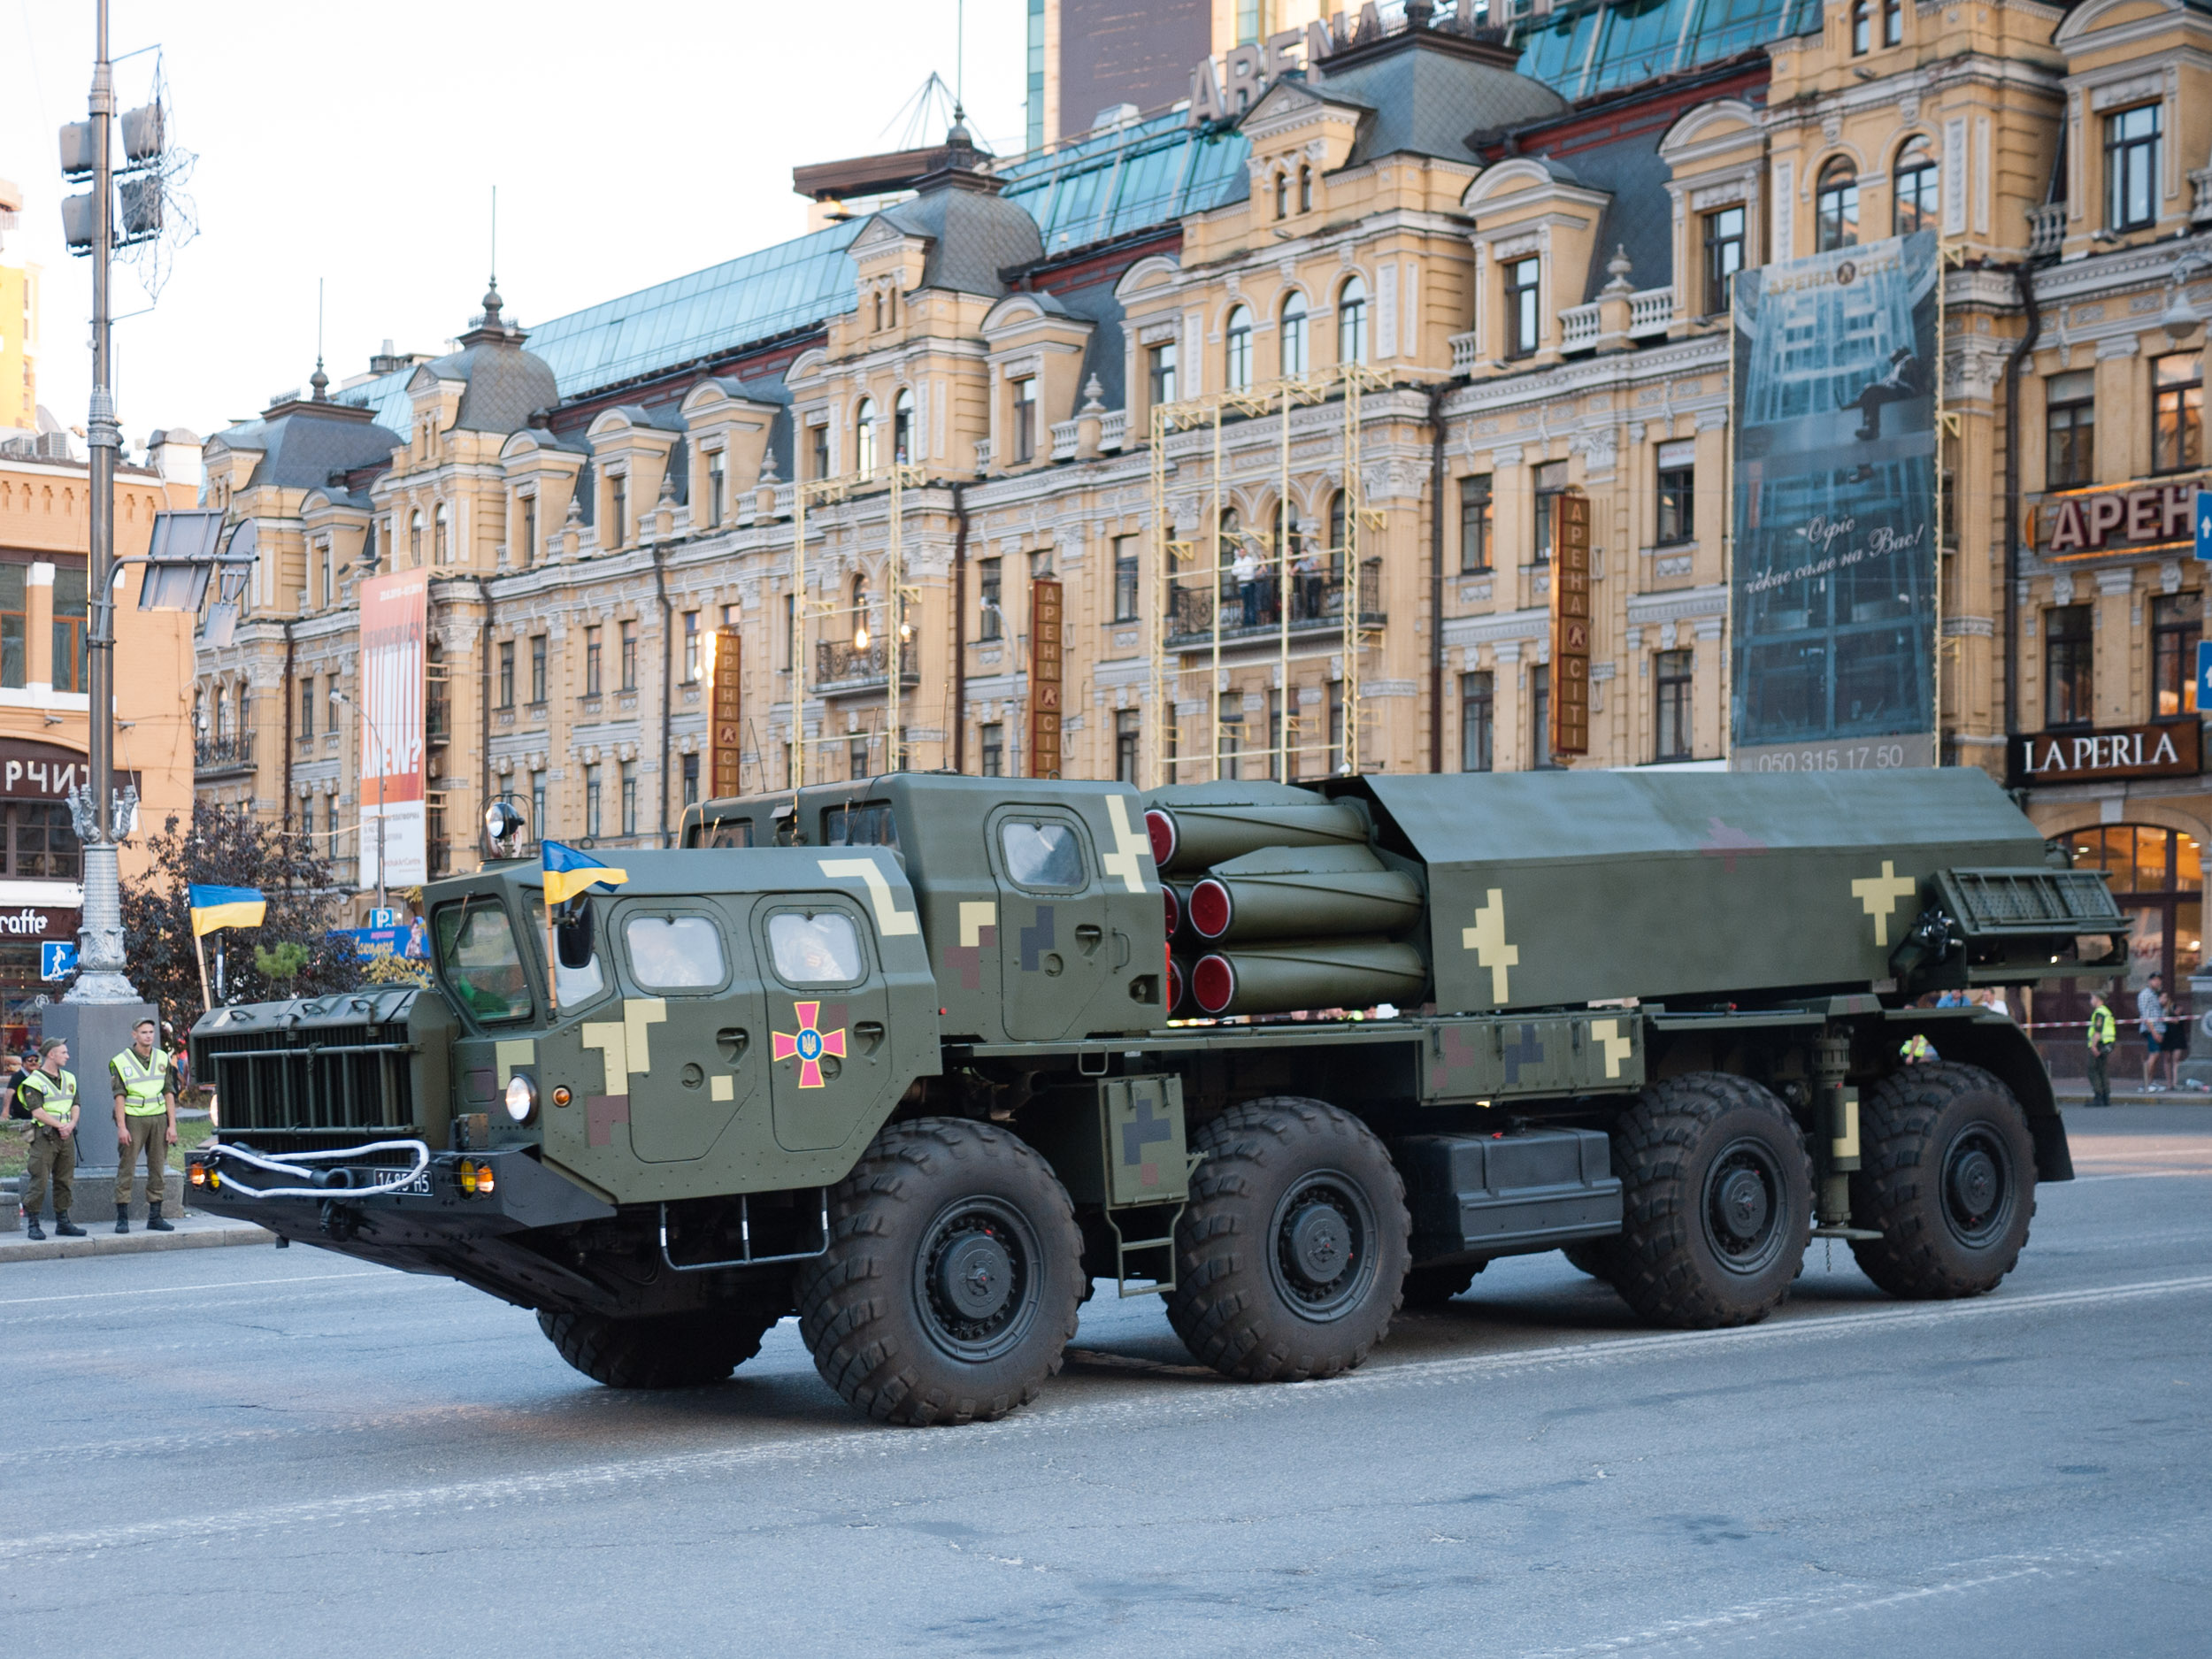 https://upload.wikimedia.org/wikipedia/commons/7/76/Vilkha_missile_complex%2C_Kyiv_2018%2C_47.jpg